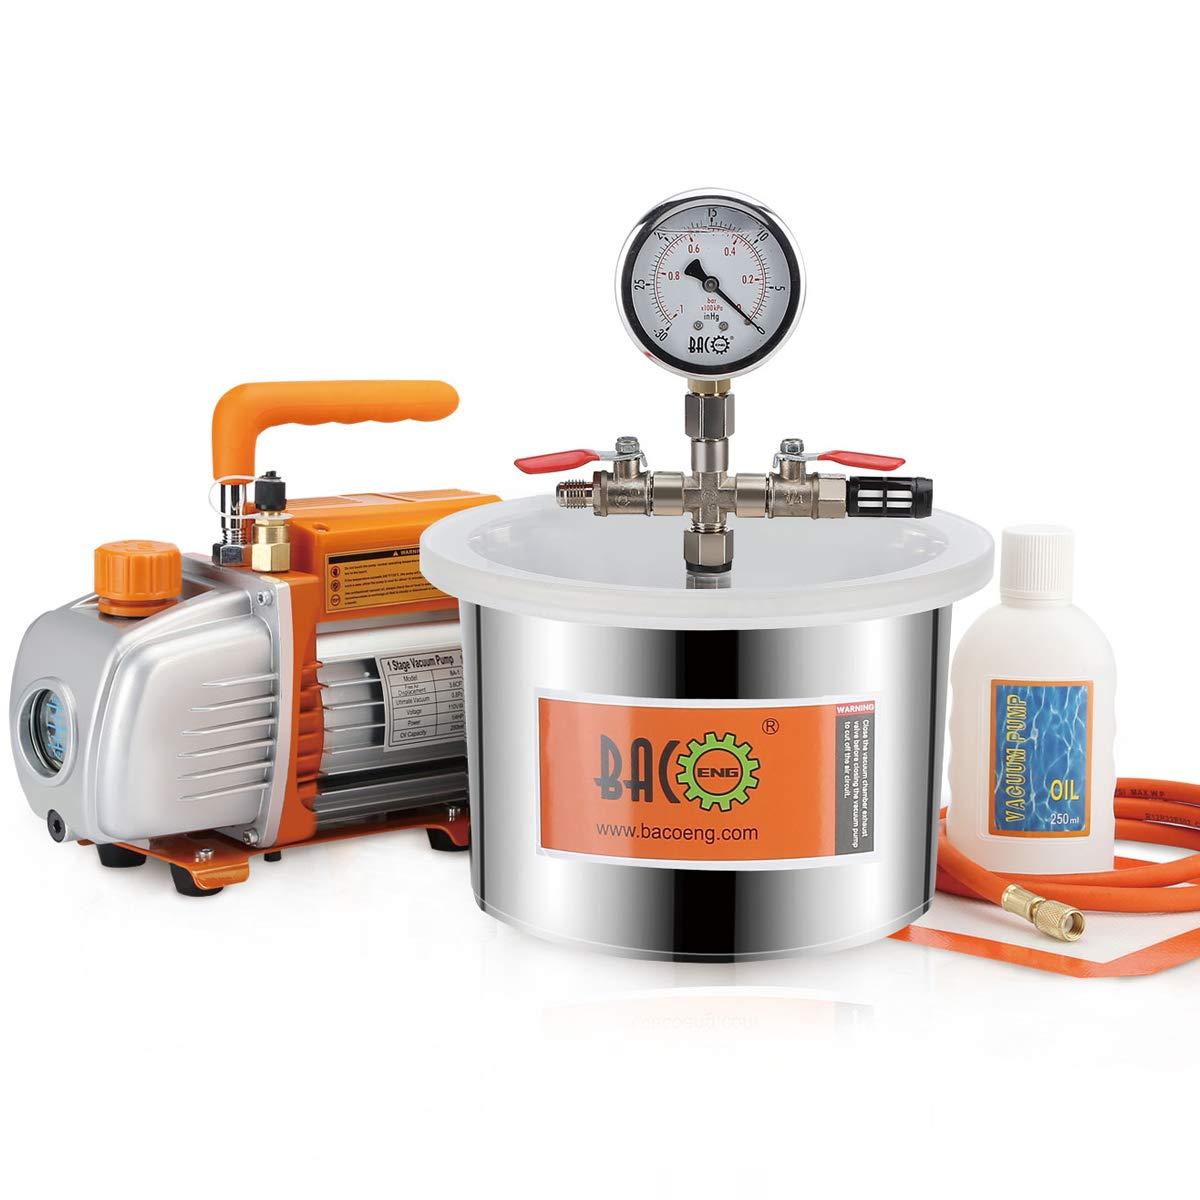 Bacoeng 6.8//12//19/litri aspirapolvere camera kit con 3/cfm singola fase pompa a vuoto con 3/pin spina UK